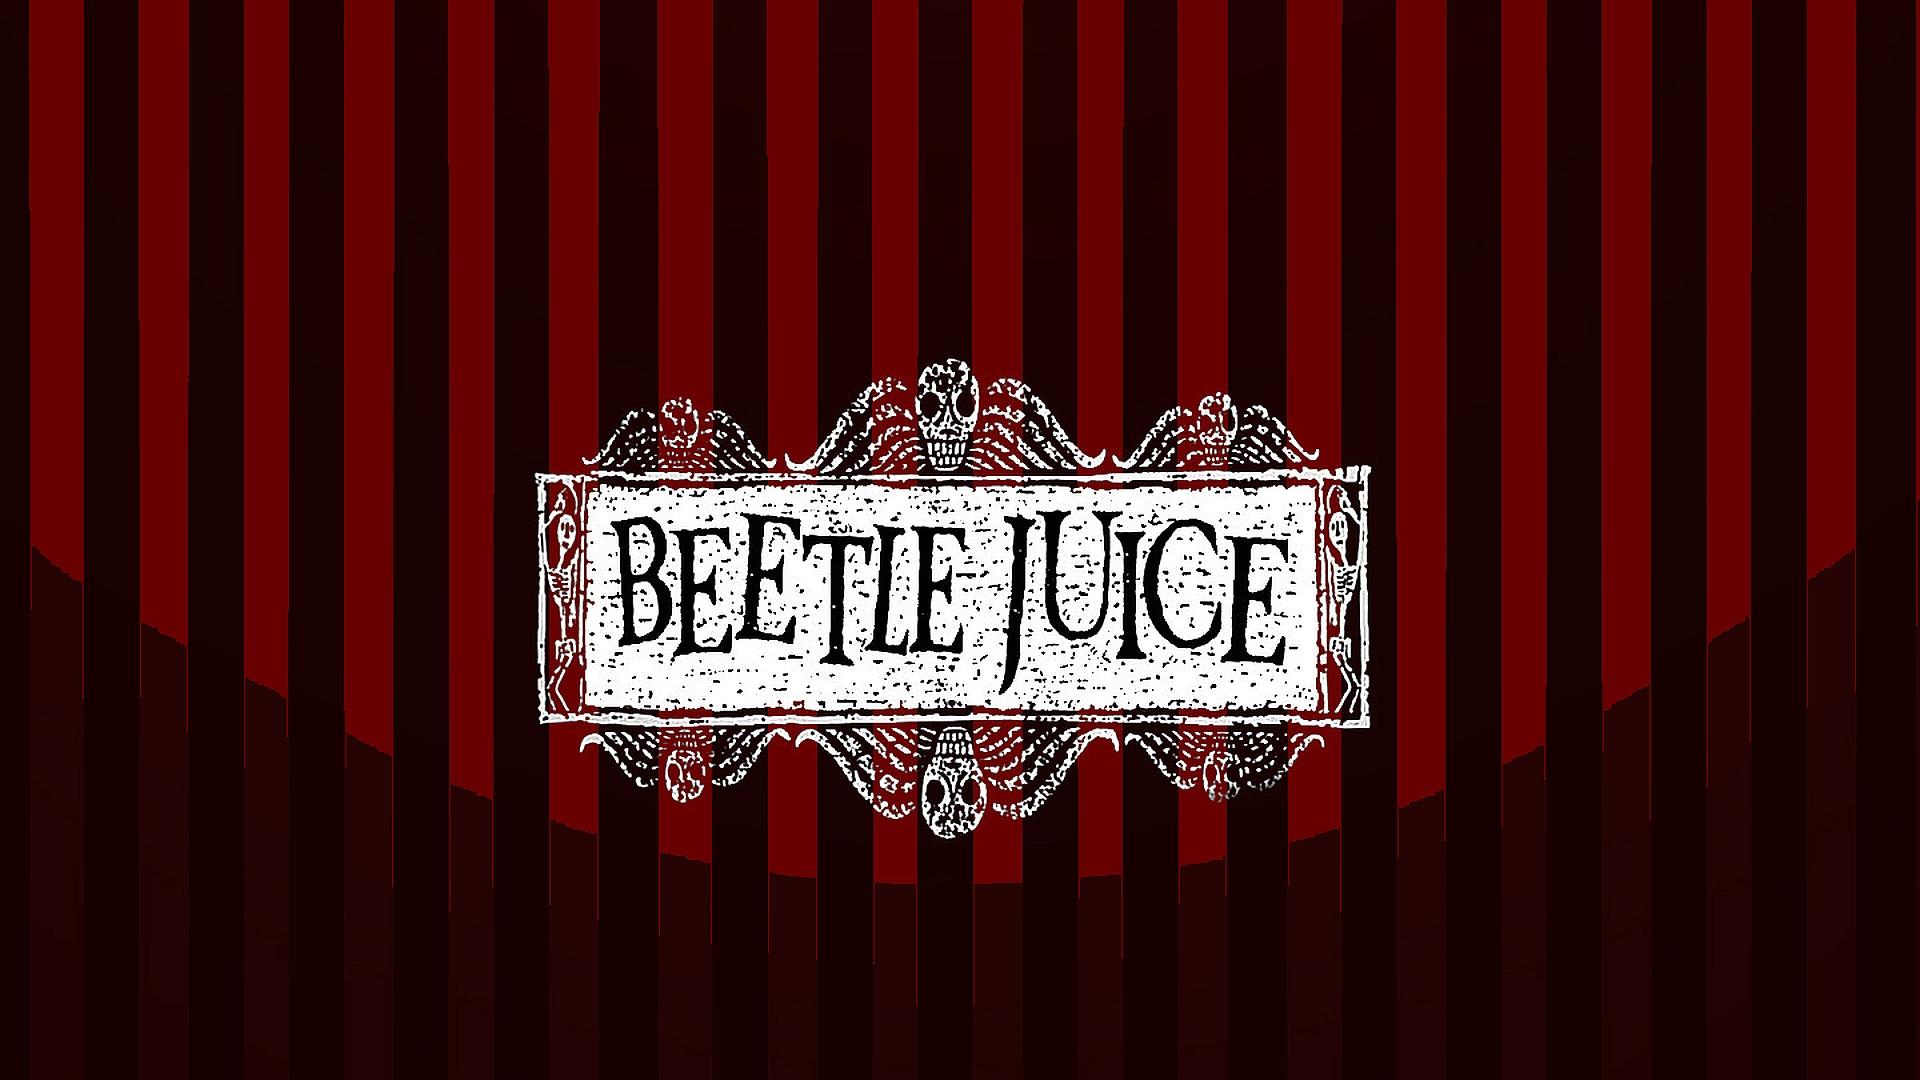 Beetlejuice HD Wallpaper | Background Image | 1920x1080 ...